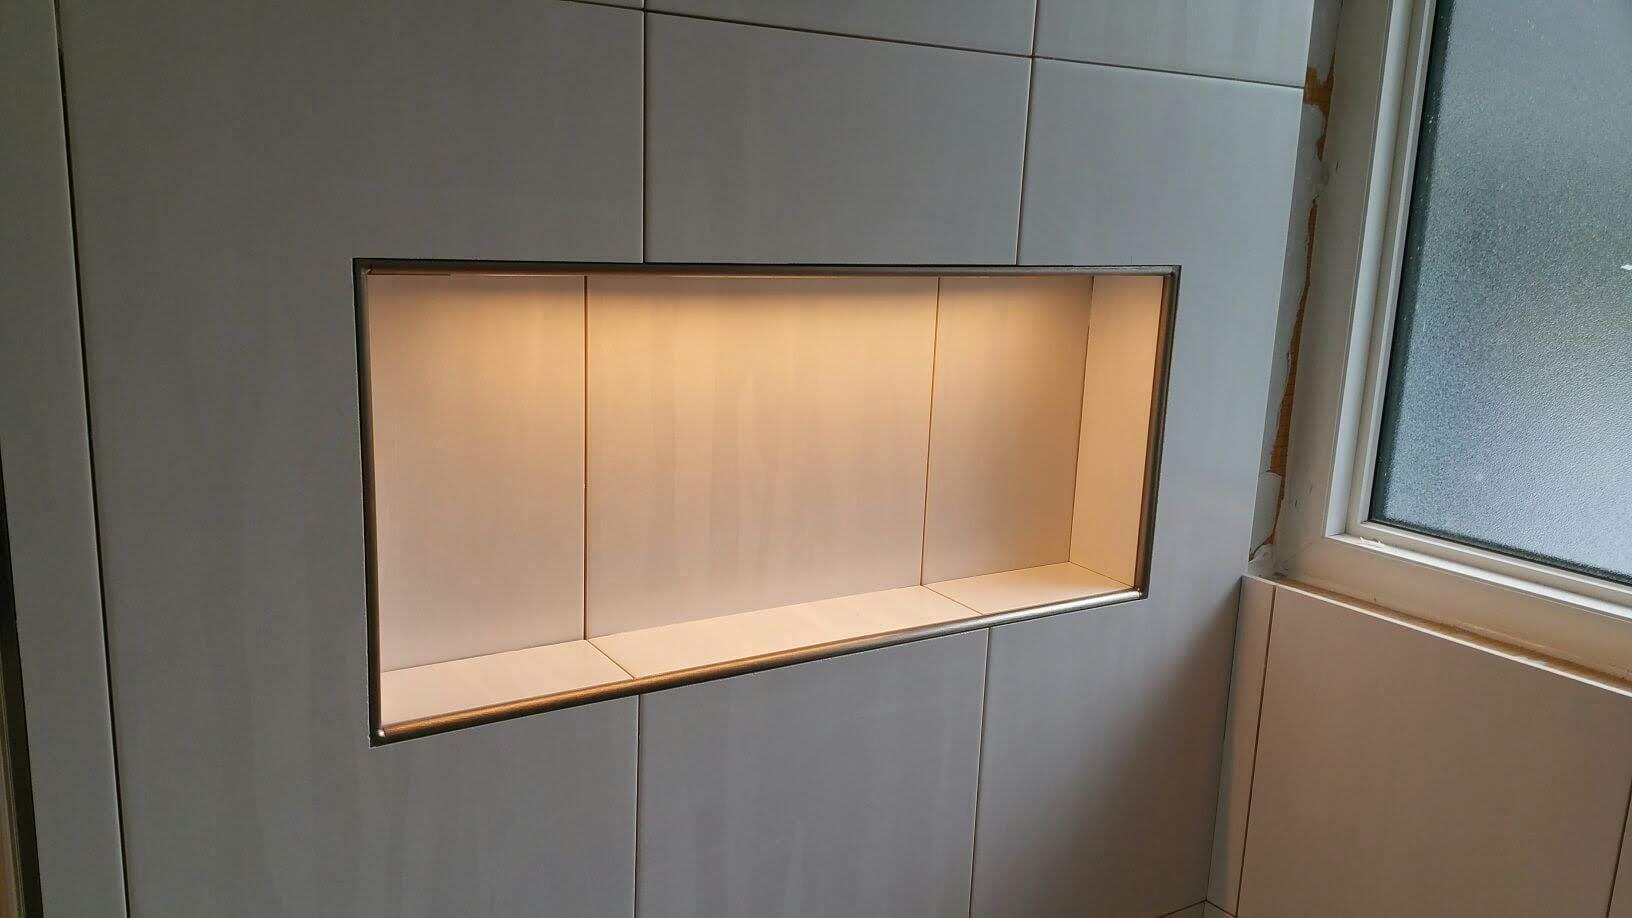 Shower & bathroom remodeling services Tampa FL from Relo Interior Design